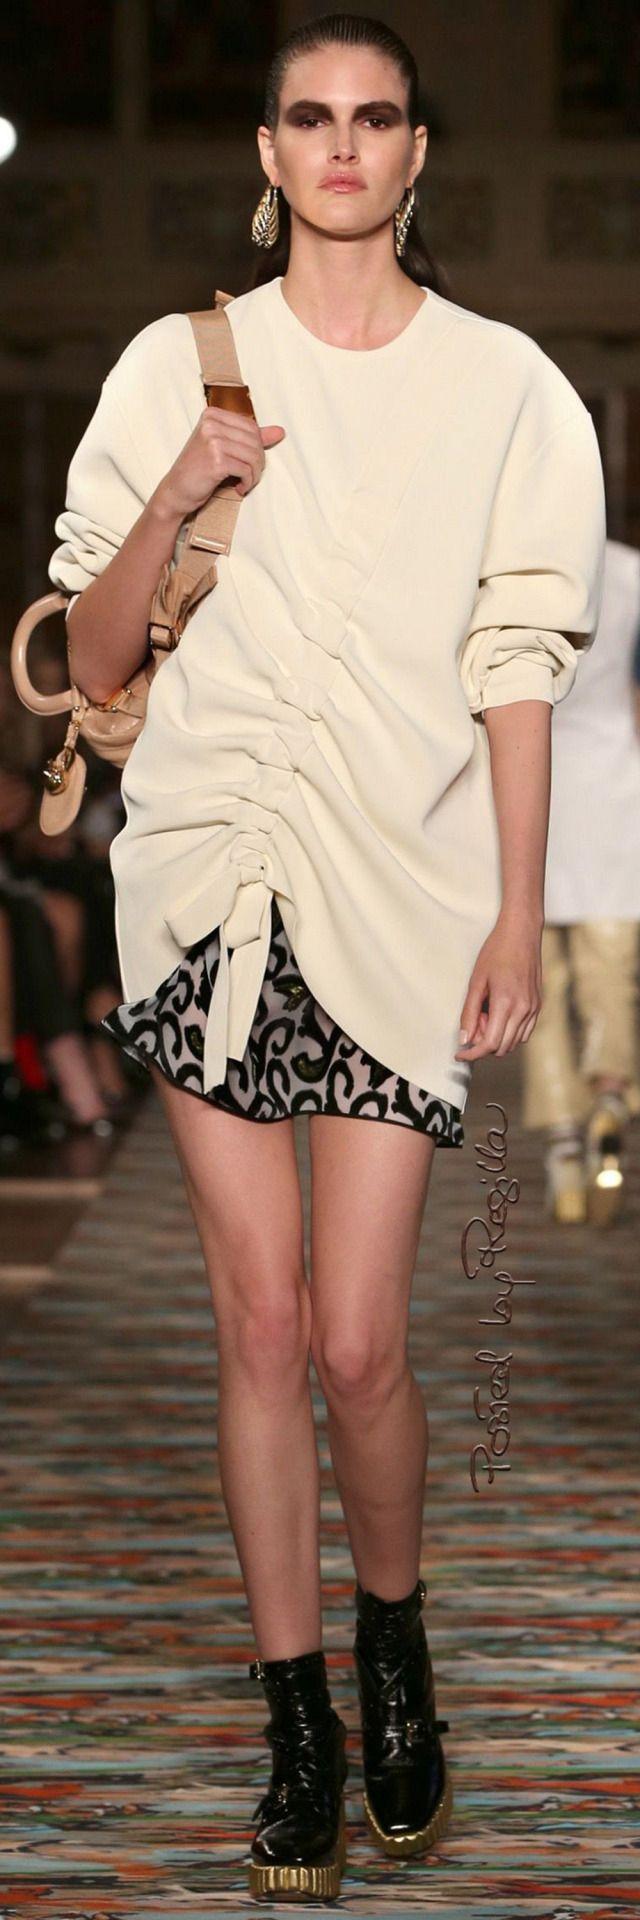 Regilla ⚜ Dior, Resort 2016/17